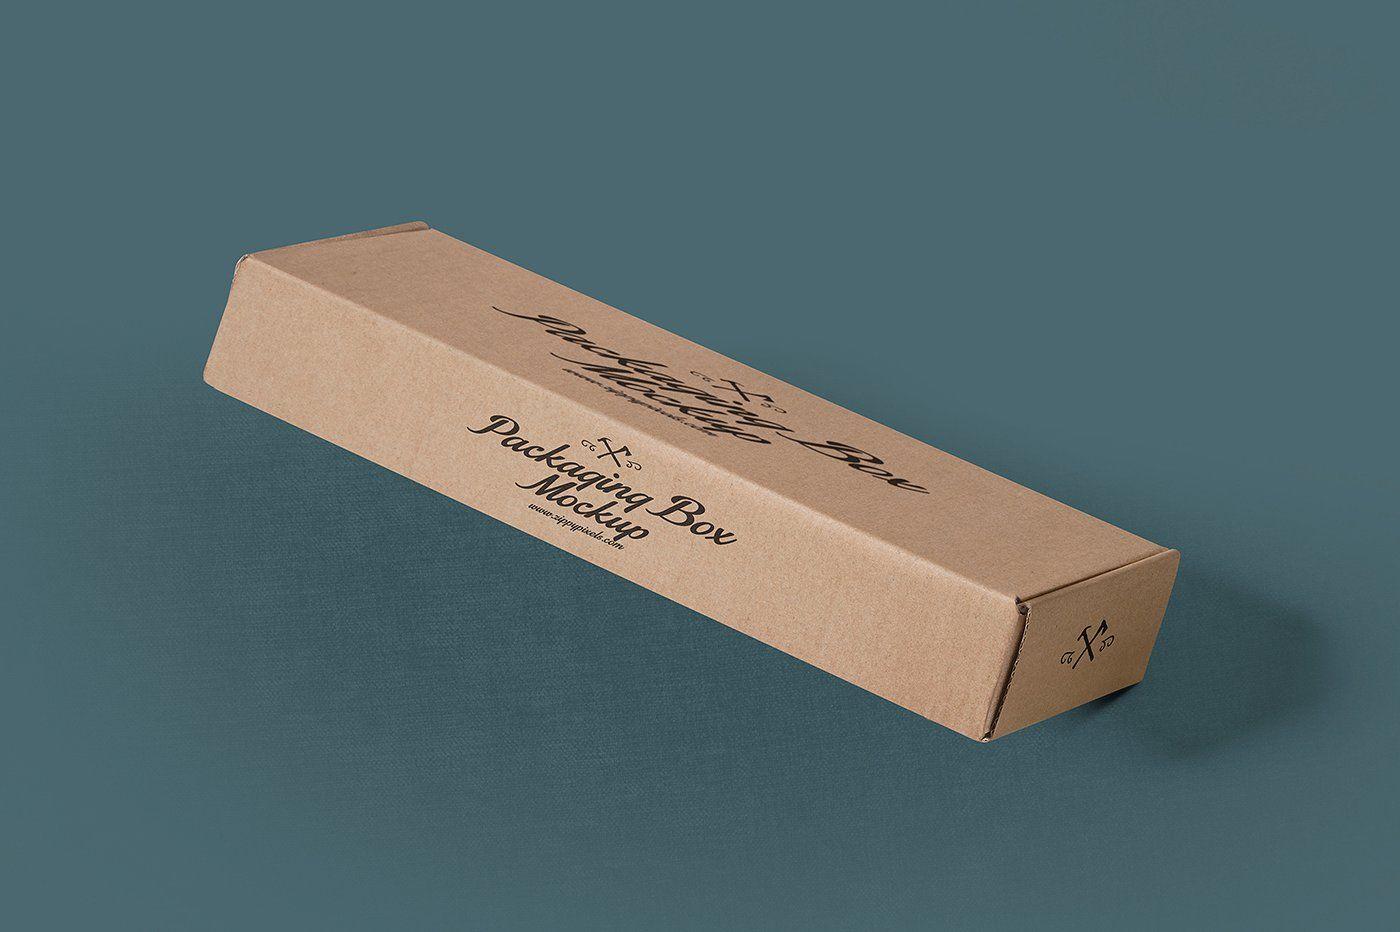 Download Rectangular Packaging Box Mockups Packaging Mockup Box Mockup Free Packaging Mockup